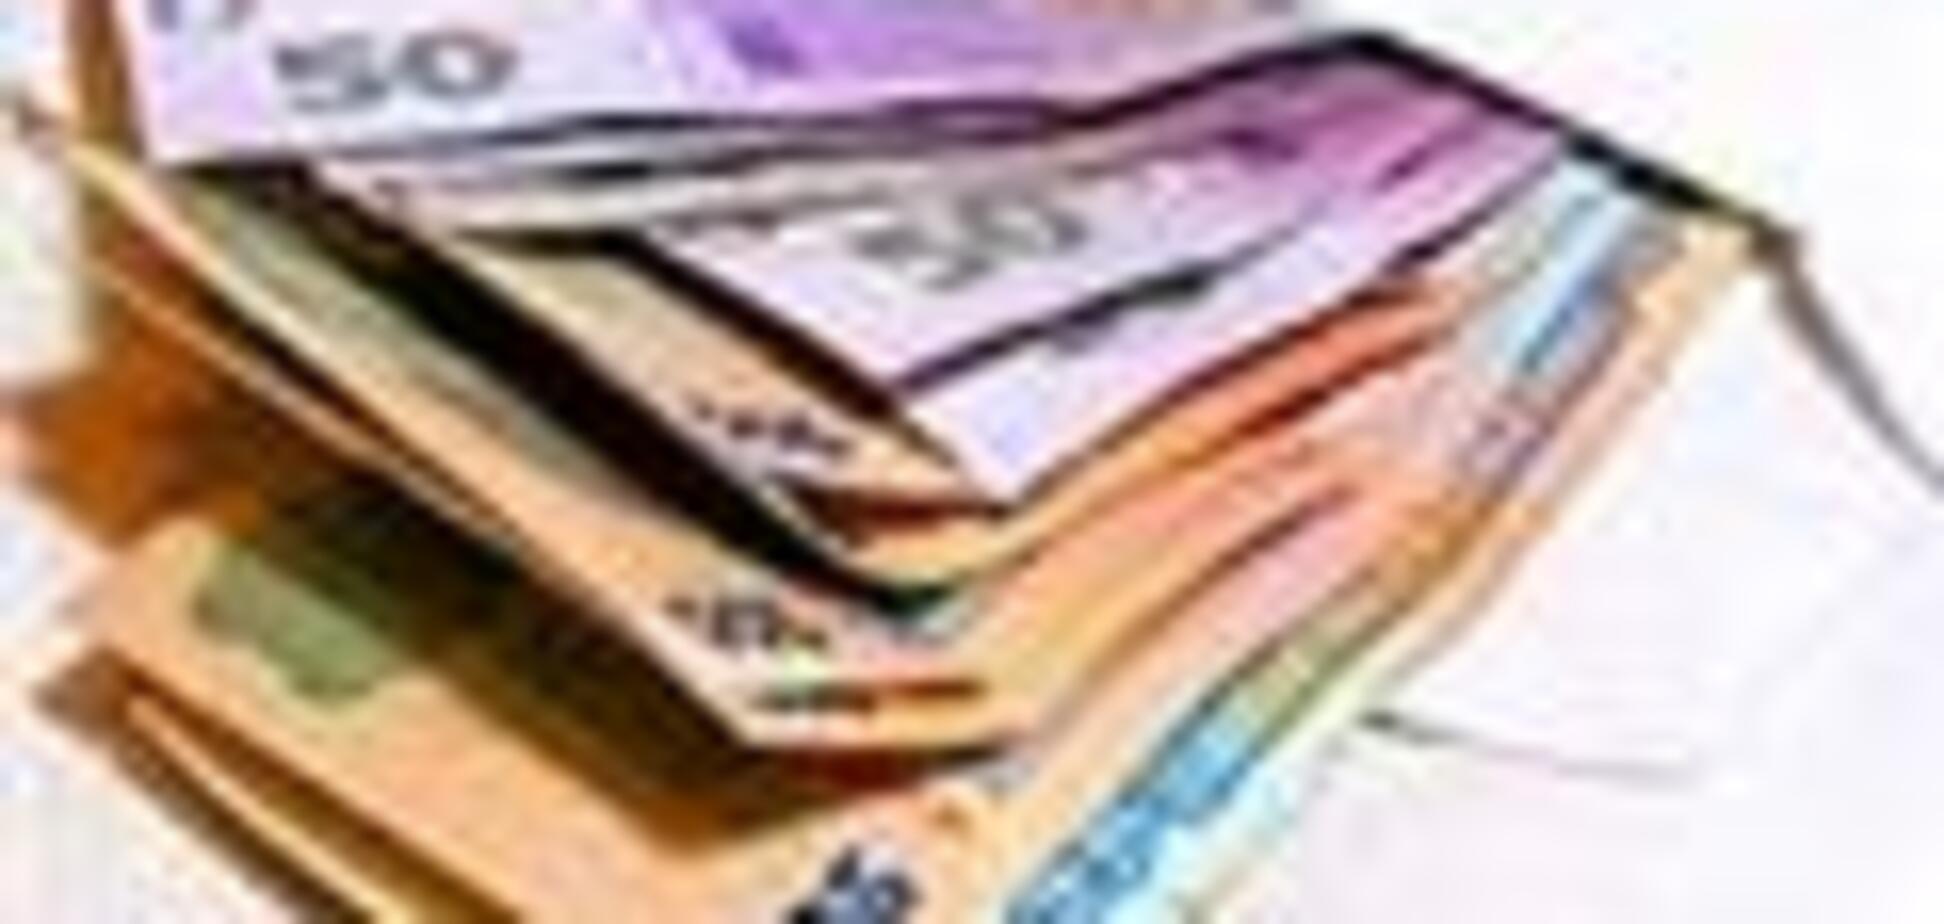 Выборы укрепят национальную валюту?